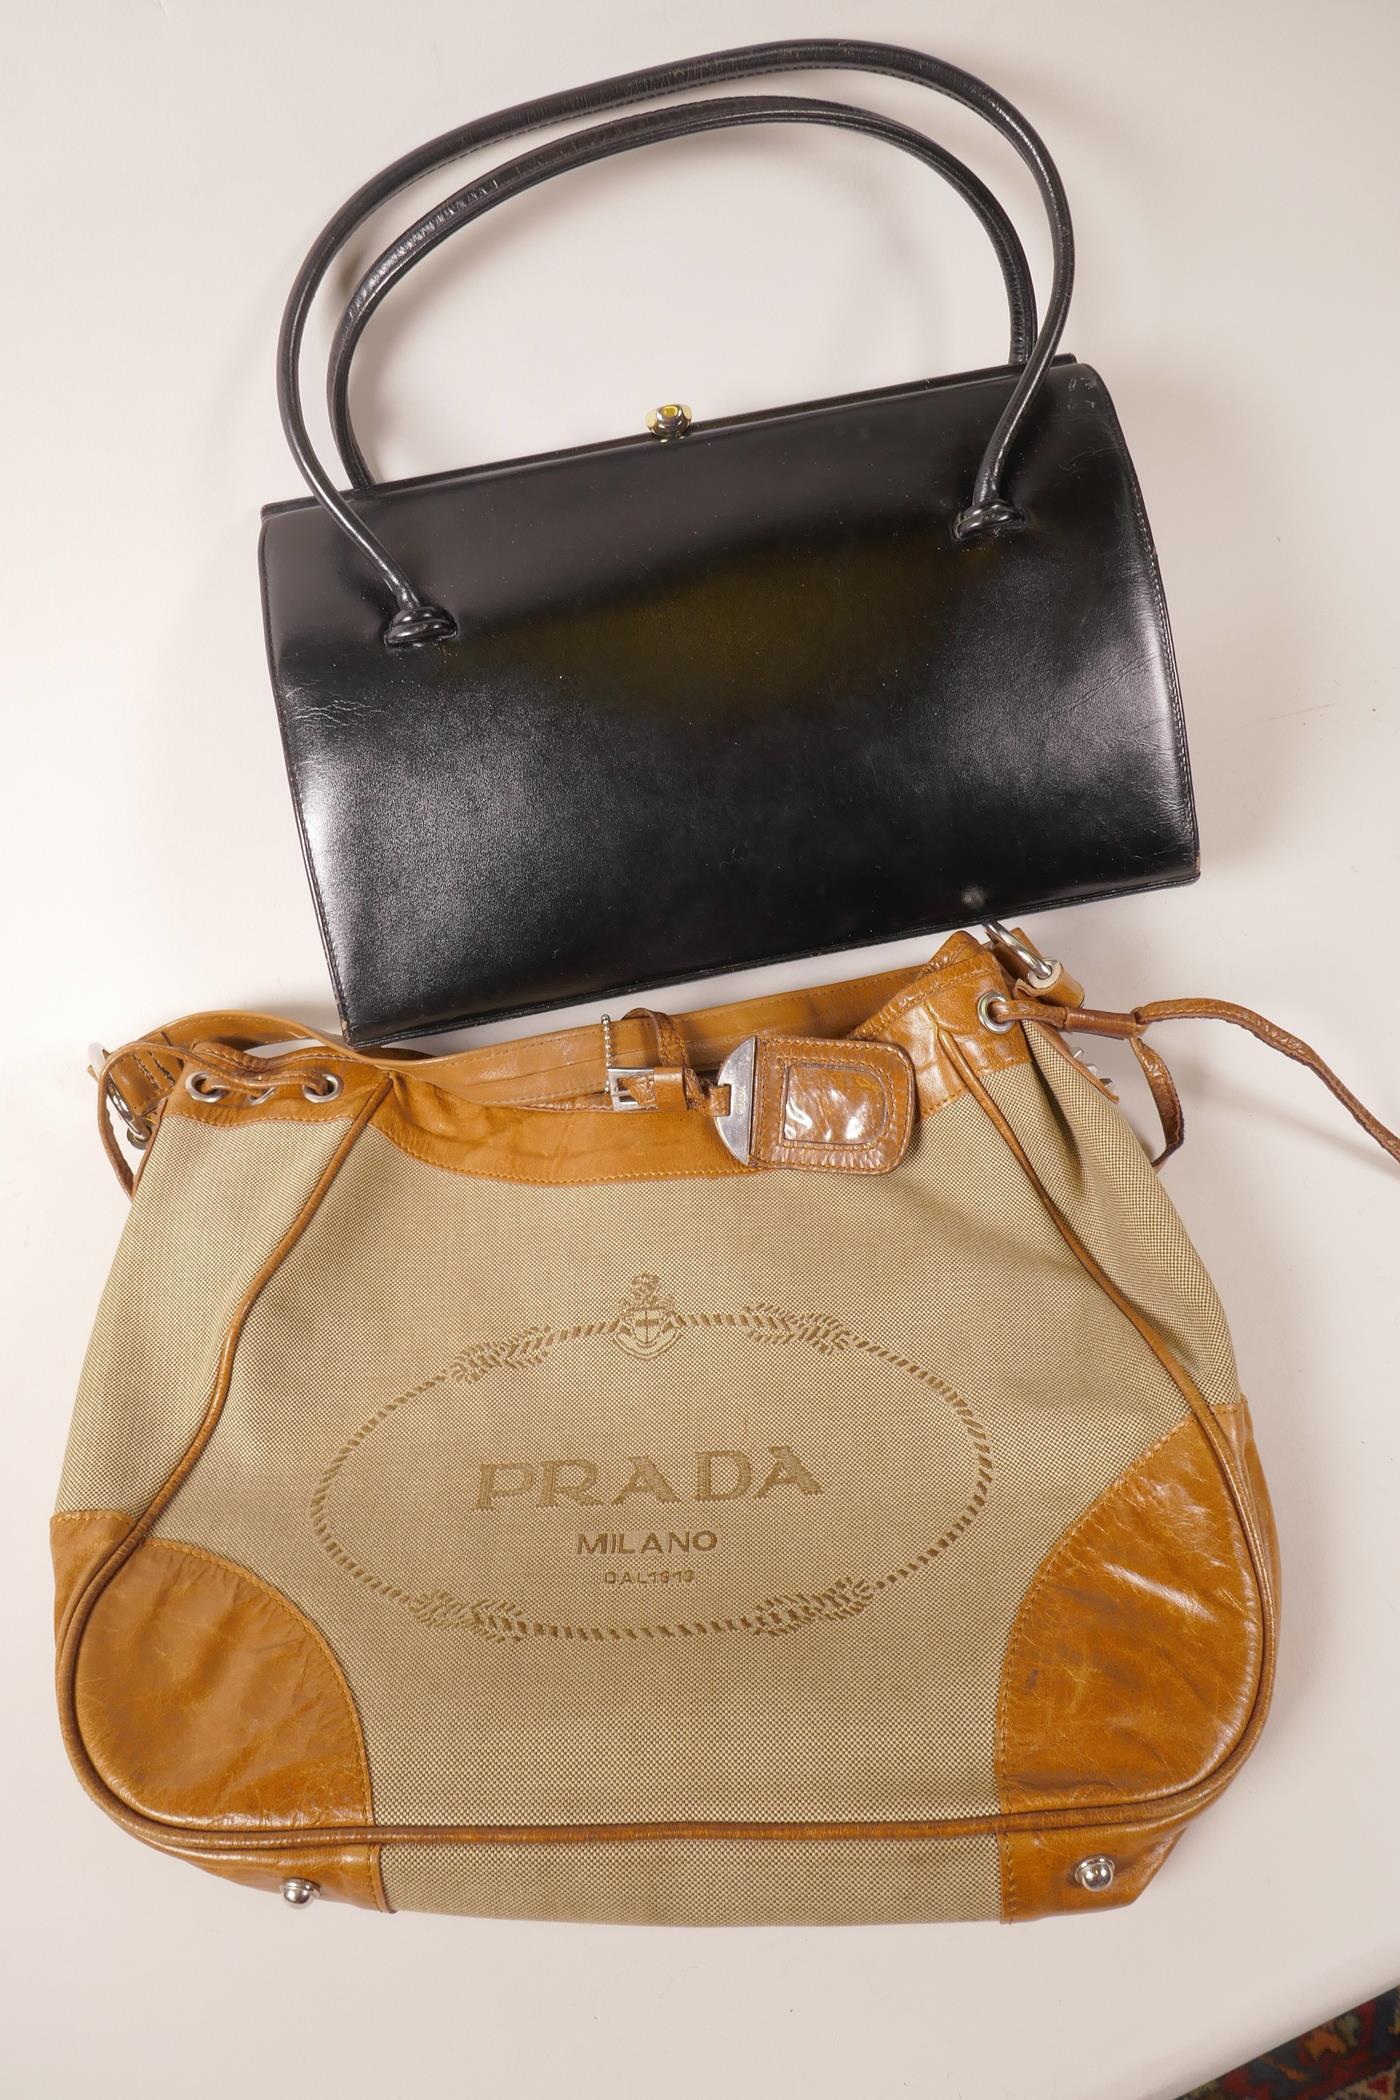 Lot 42 - A designer leather and fabric handbag, together with a vintage 'Waldybag' black leather handbag